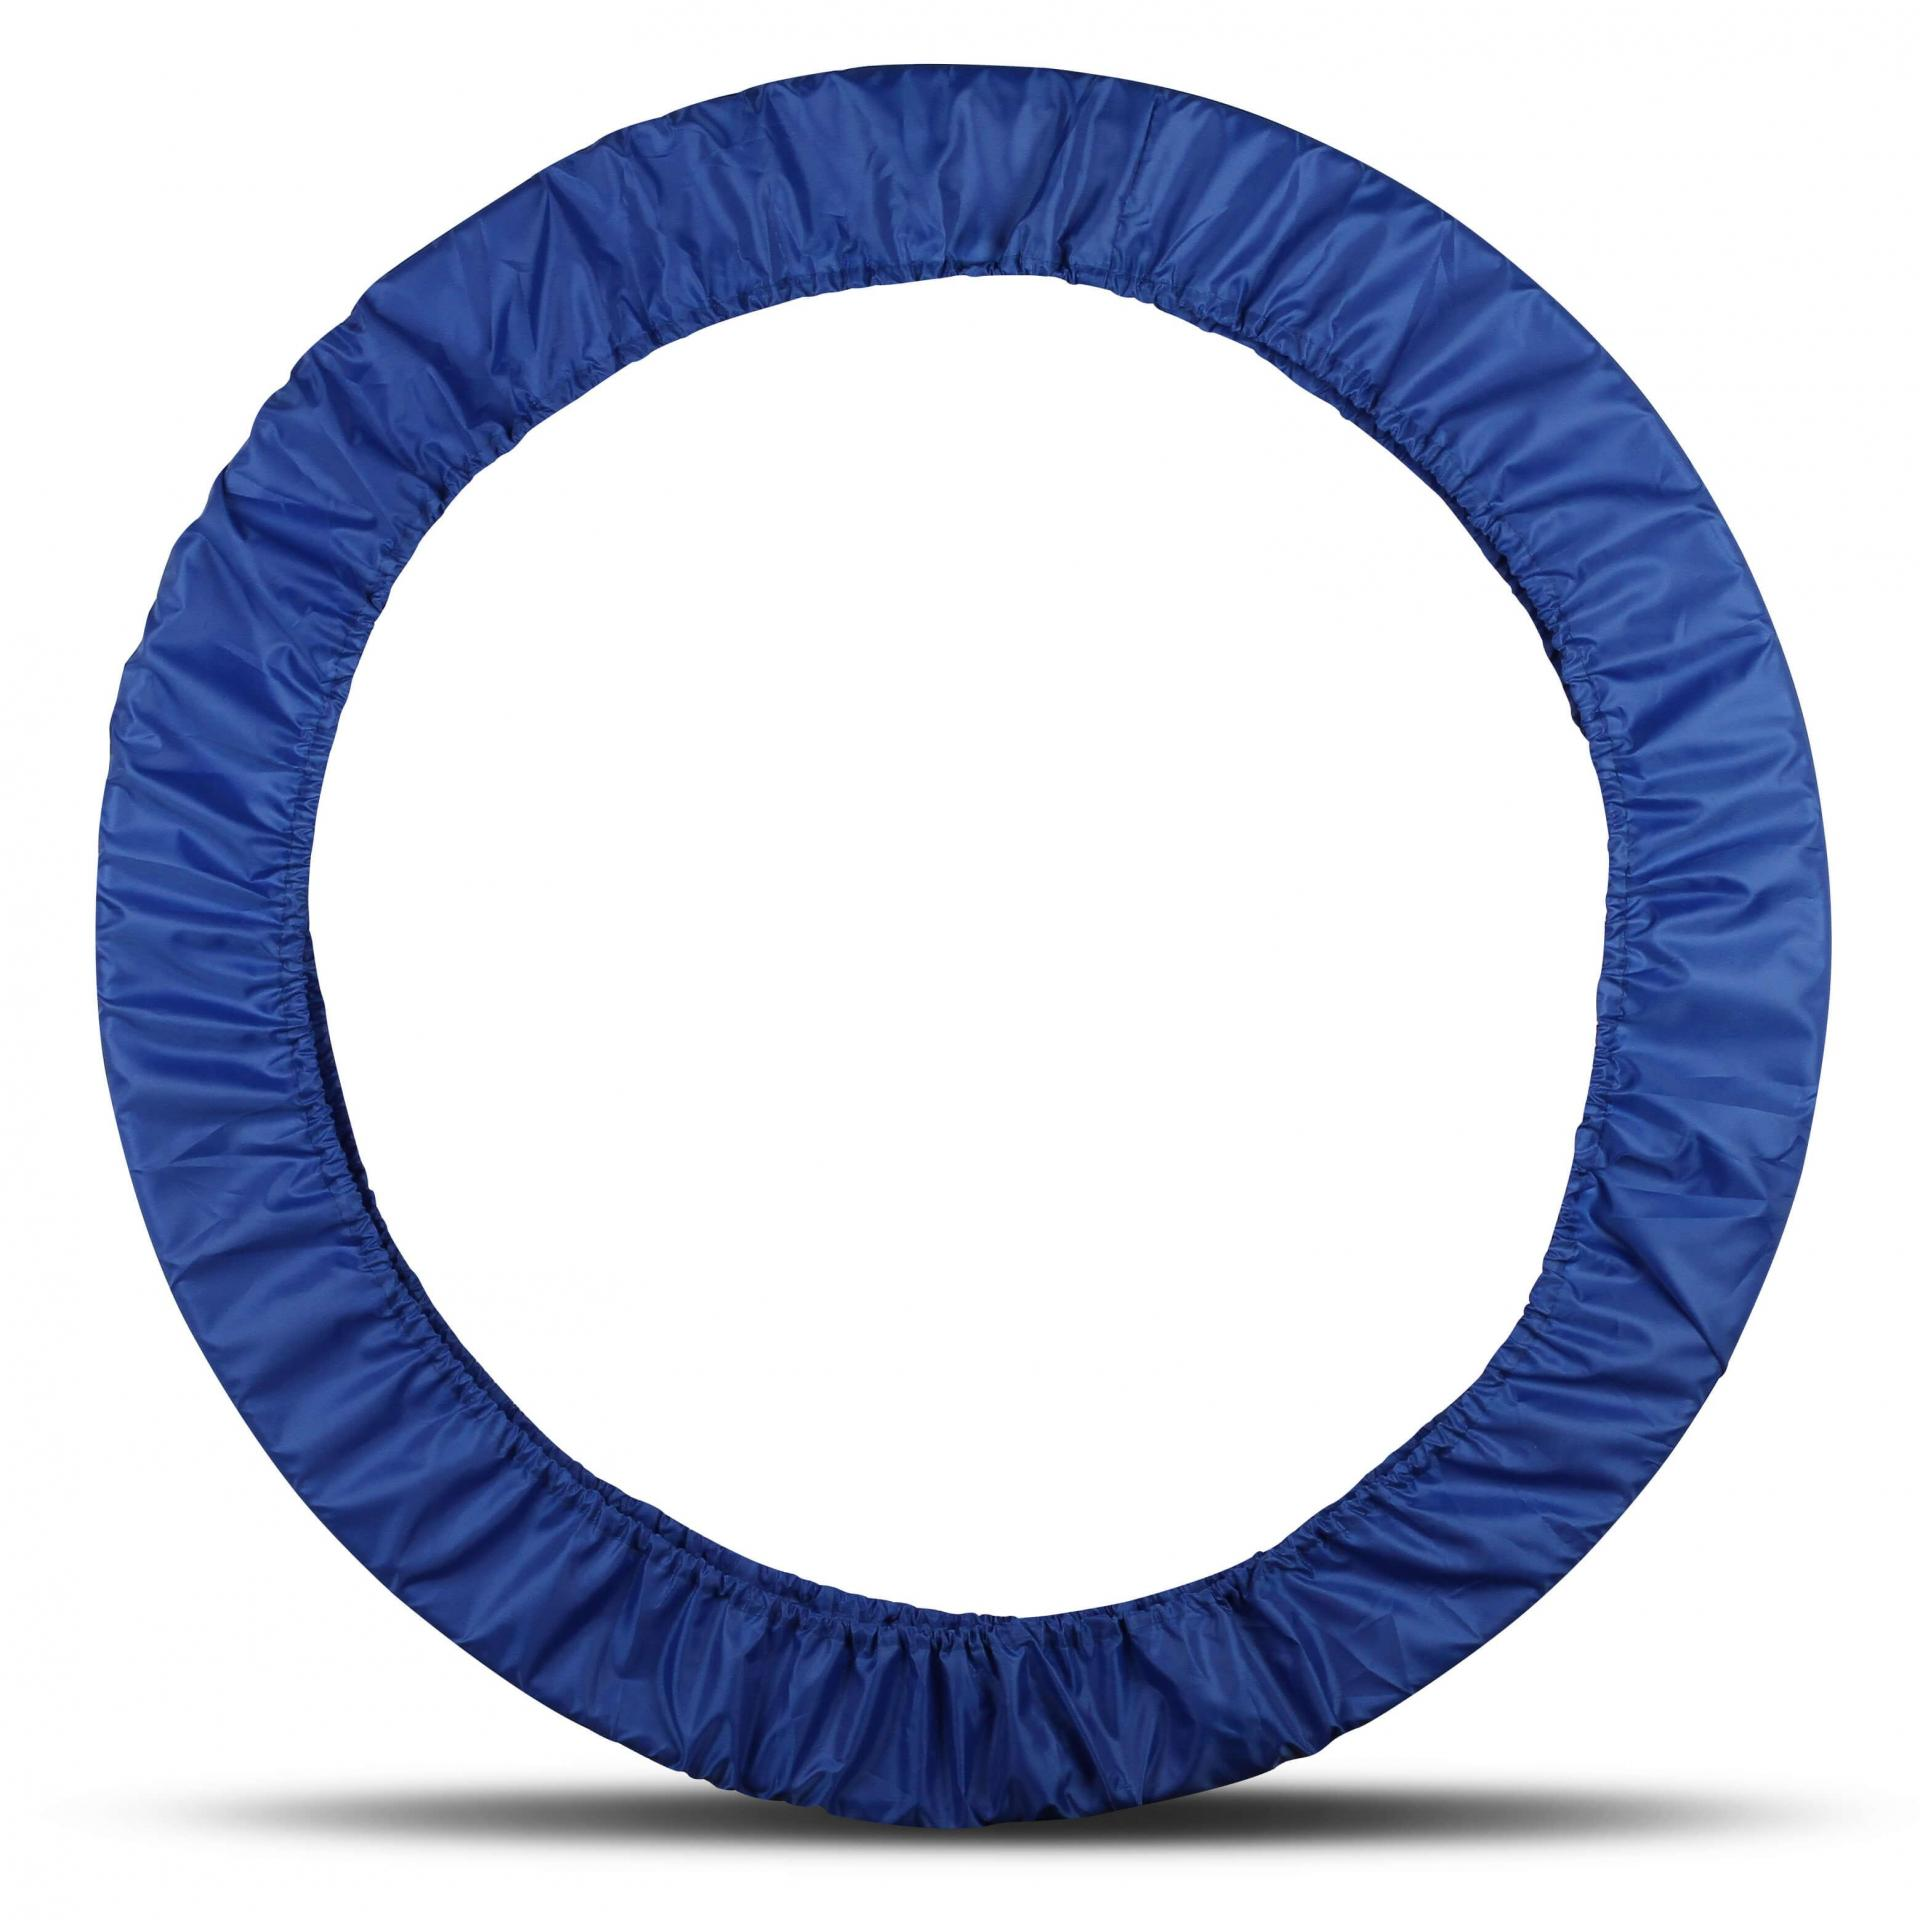 Funda de Aro Impermeable INDIGO, 1 color